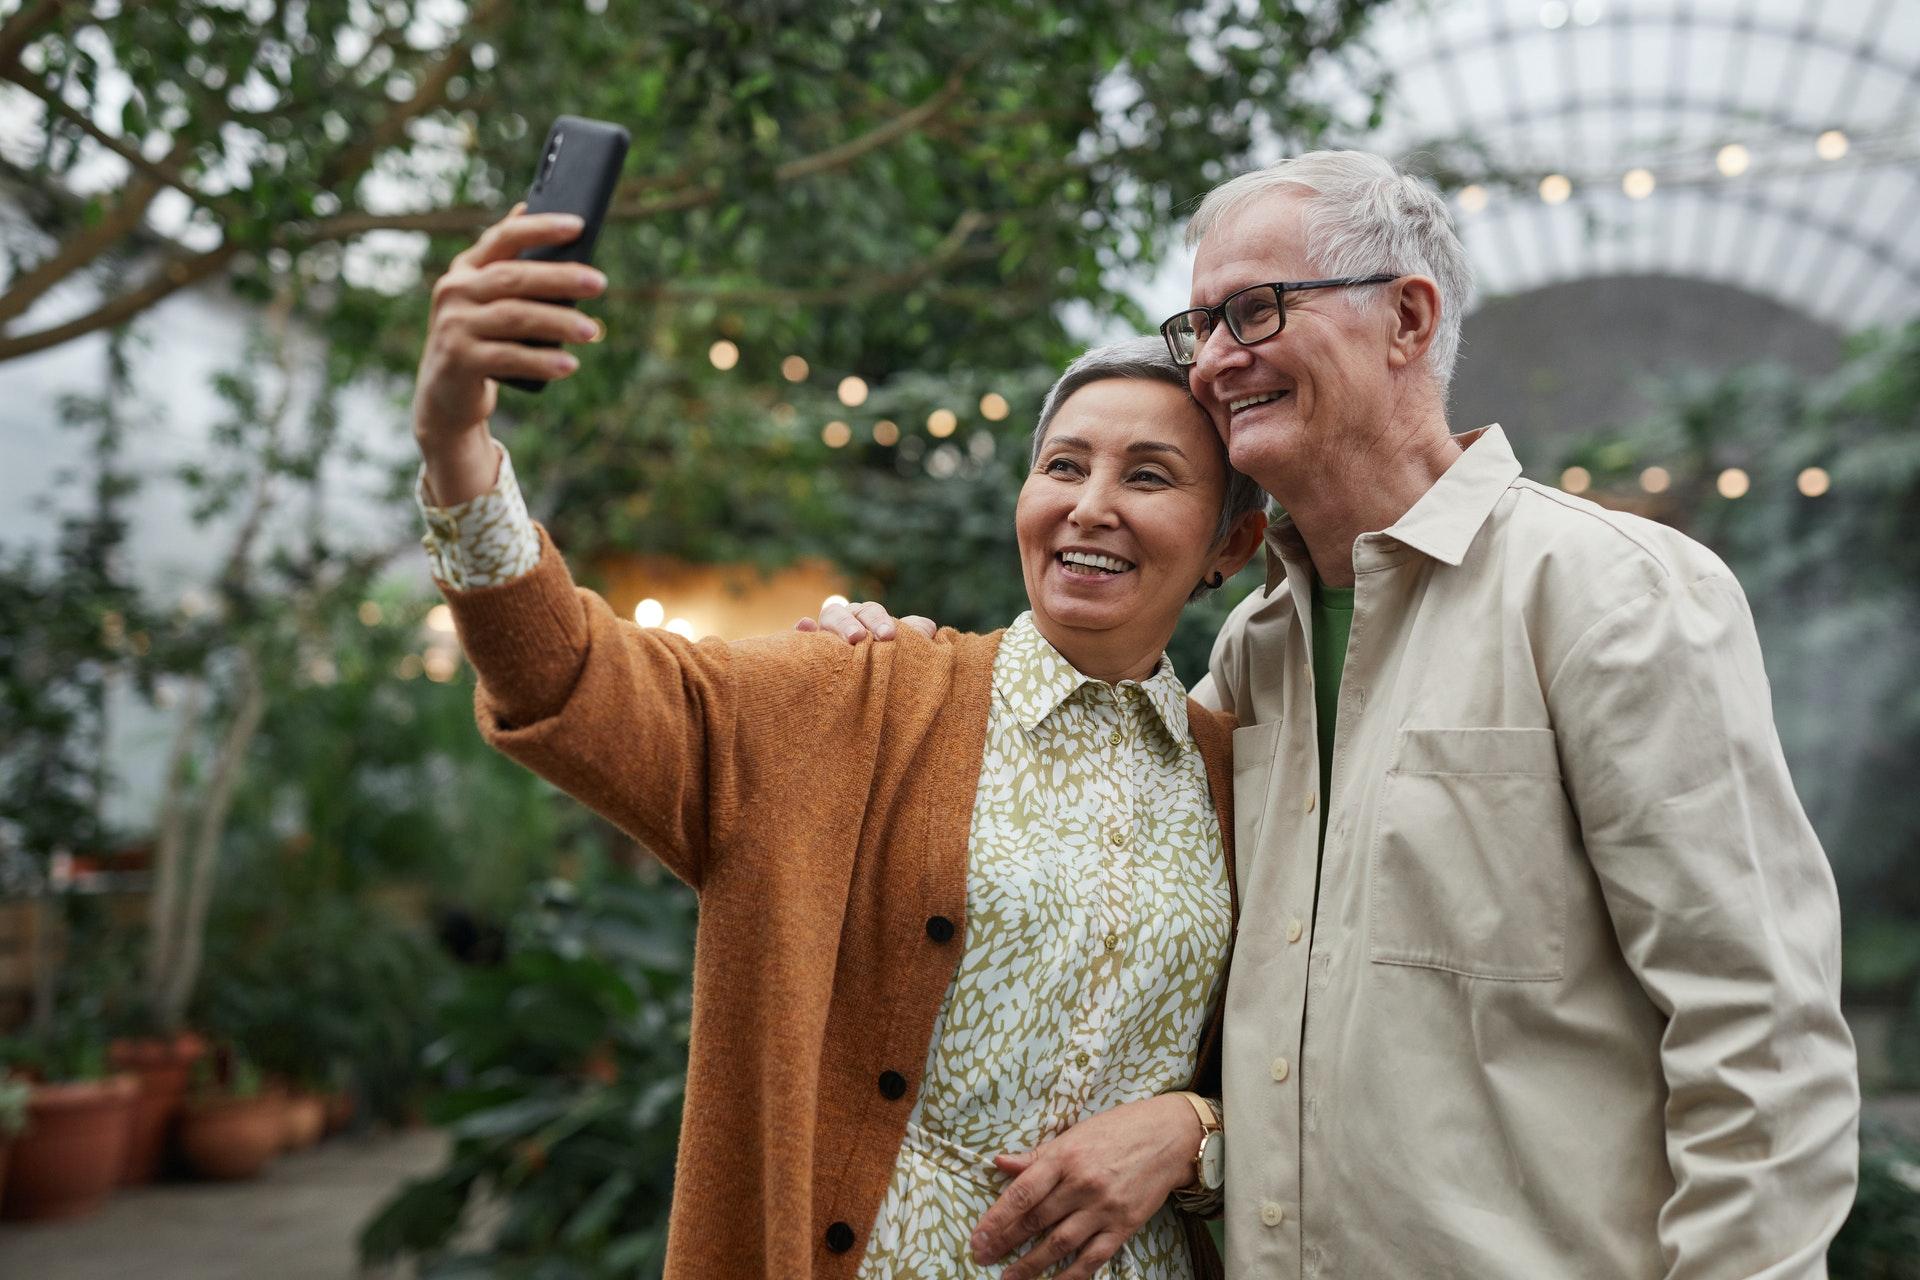 senior couple smiling while taking a sefie